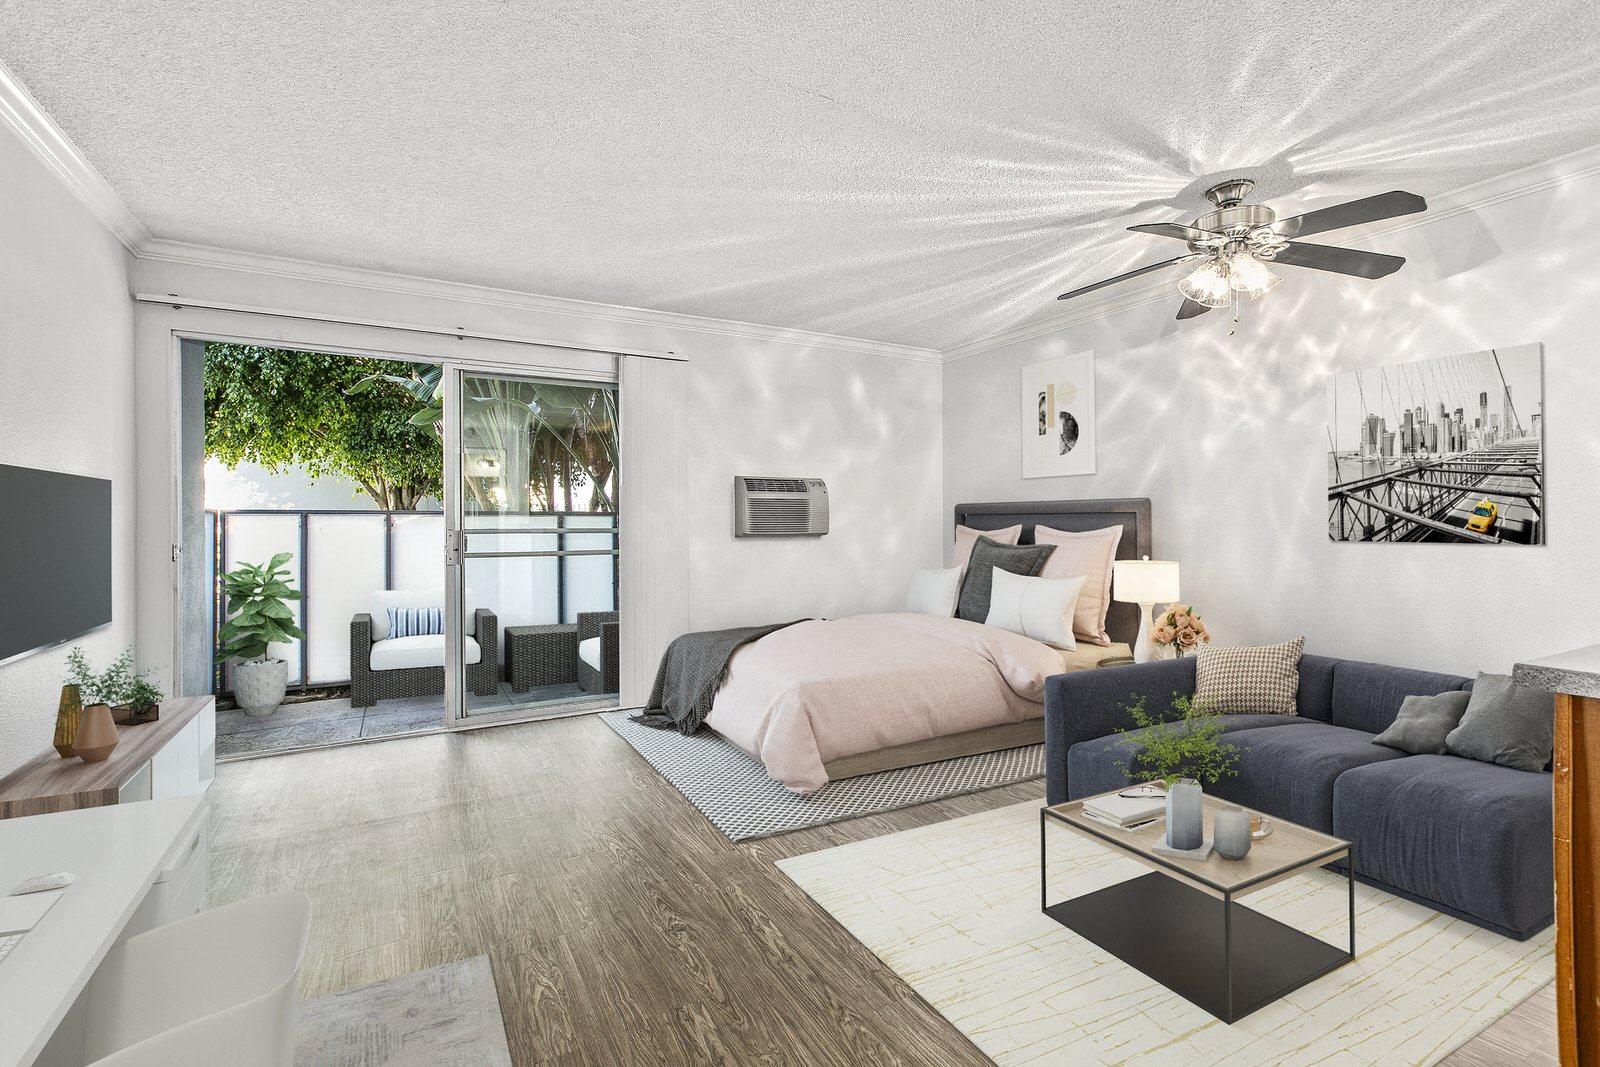 Interior Photo Studio For Rent at Milano Apartments 20900 Anza Ave Torrance, CA 90503